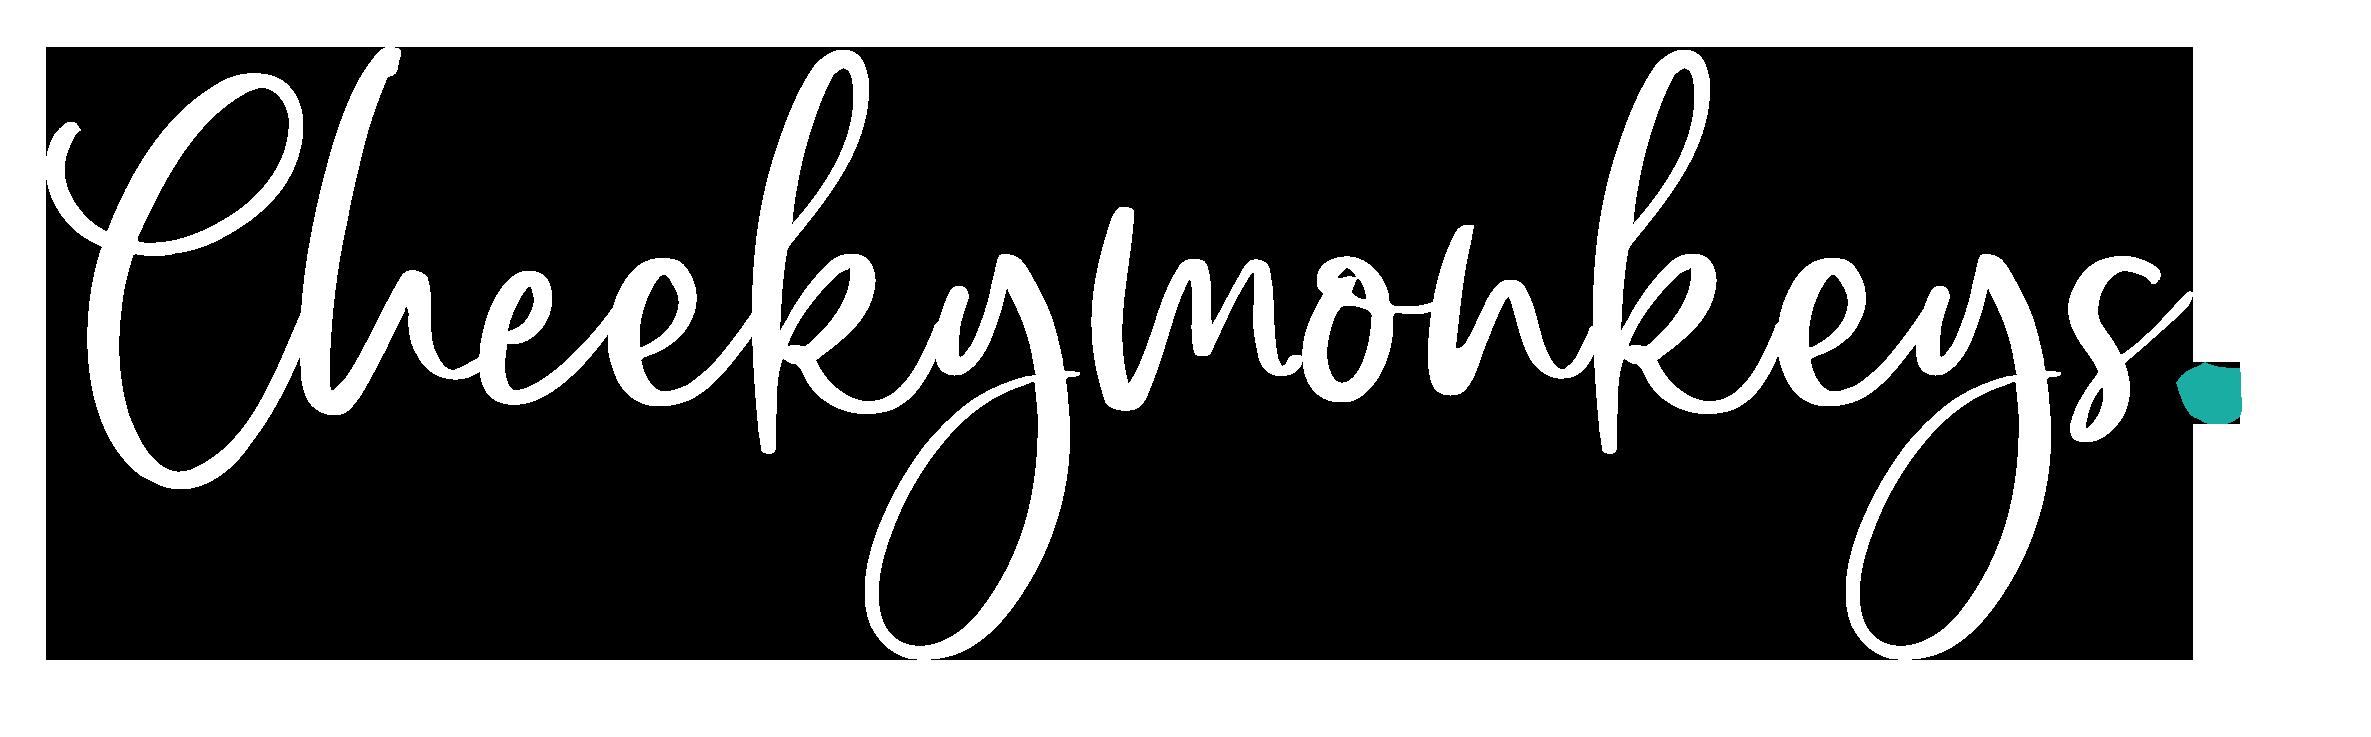 Cheekymonkeys